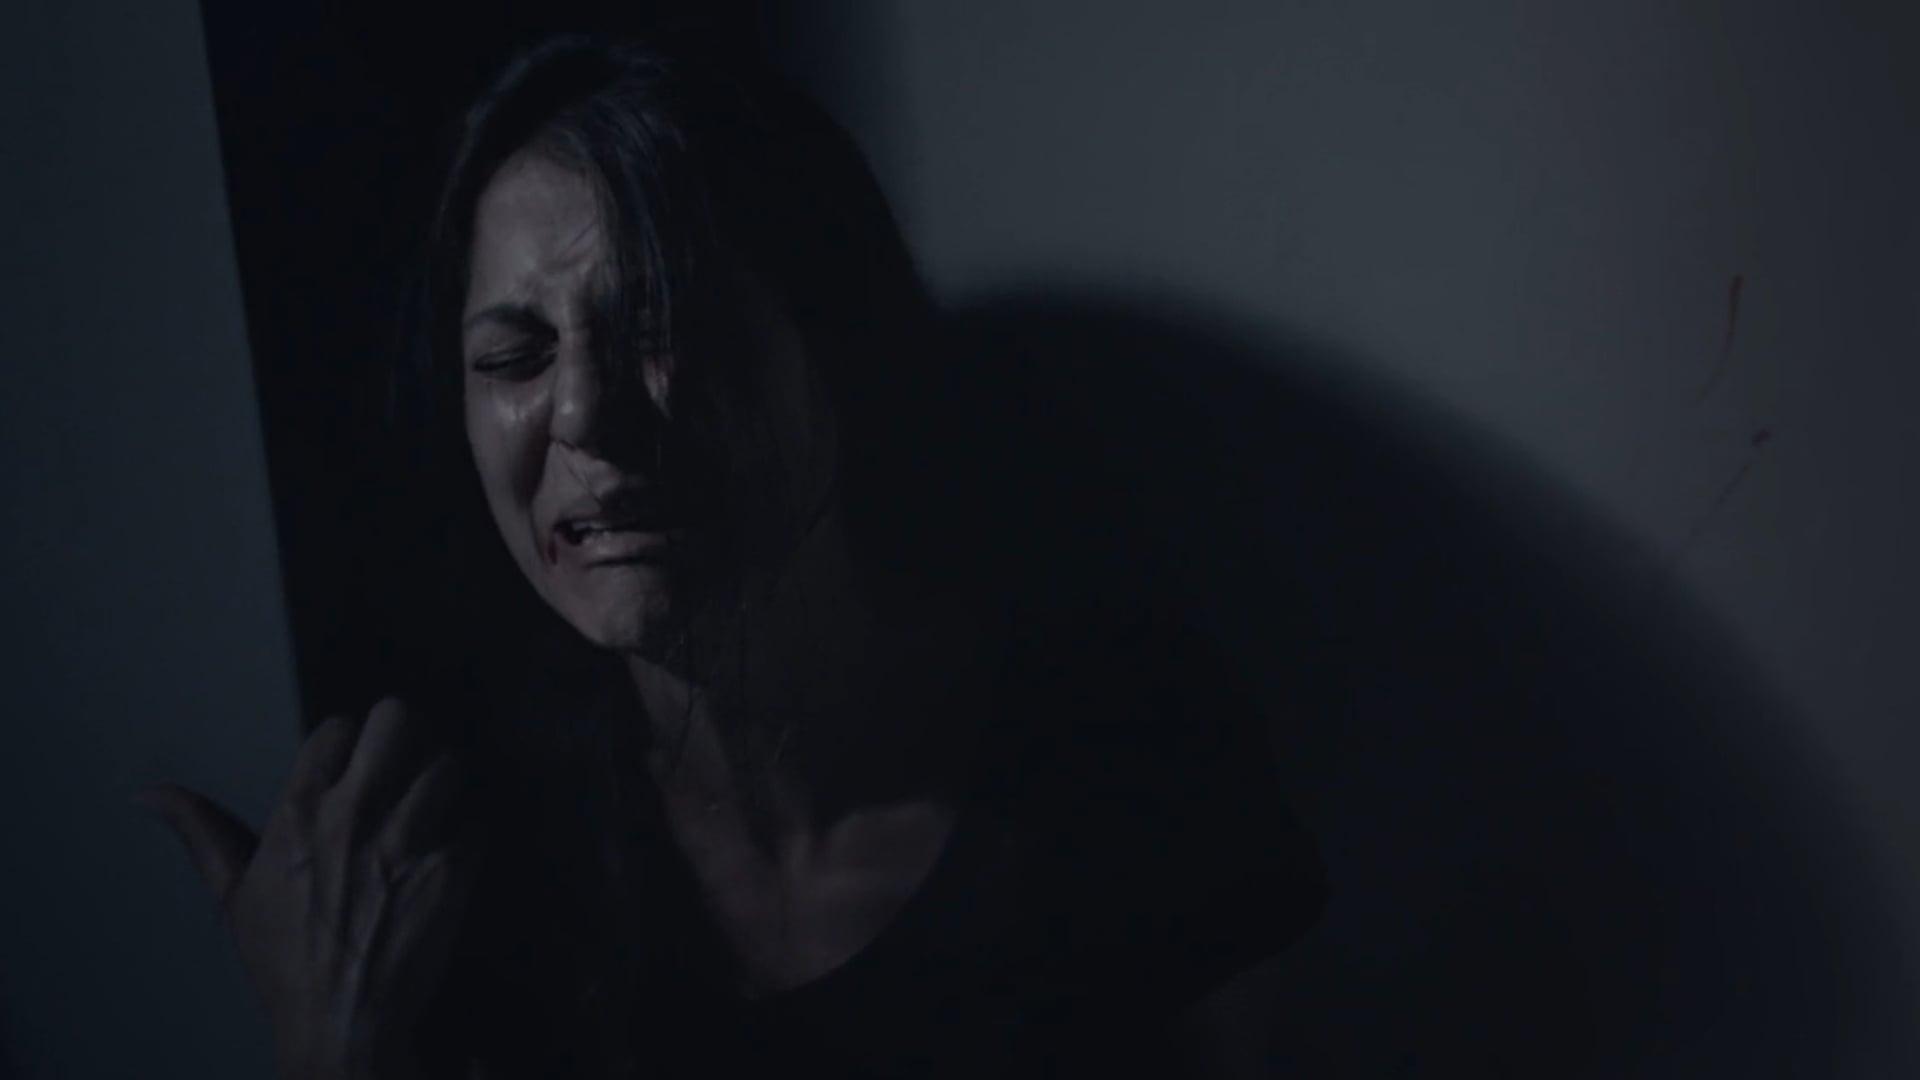 Semih Menda - Anti-Domestic _Violence PSA_